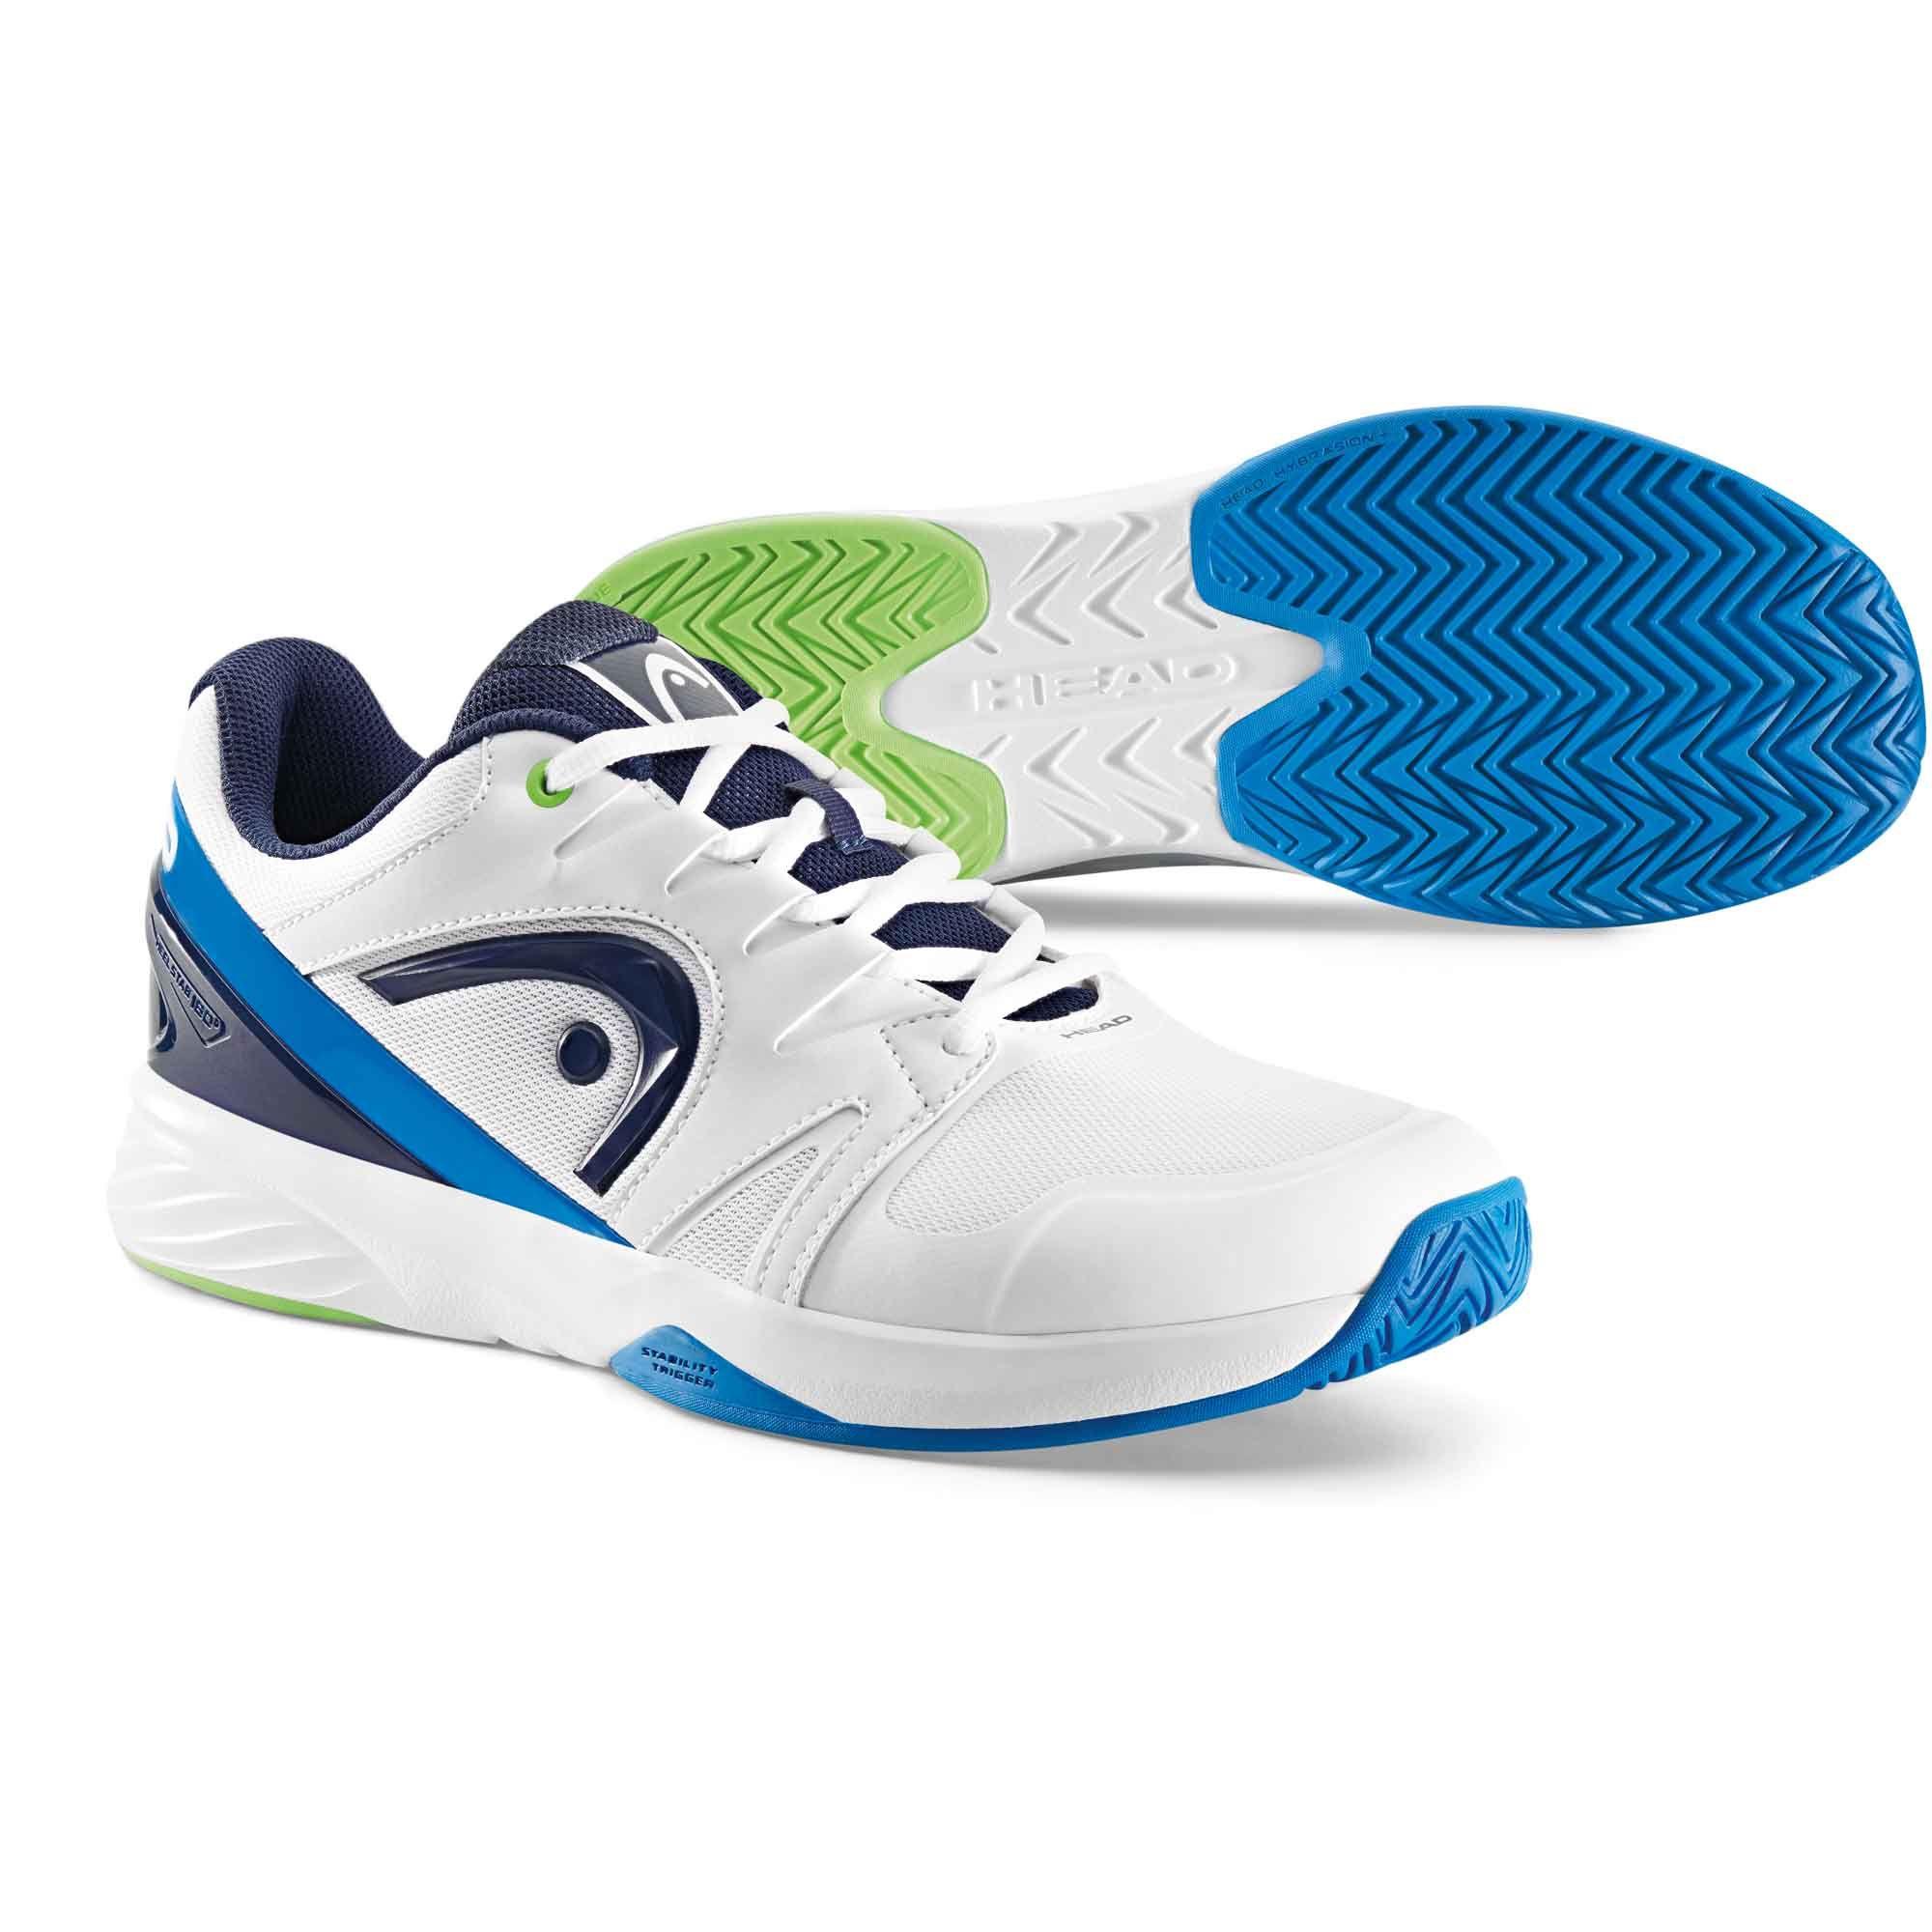 nitro team mens tennis shoes